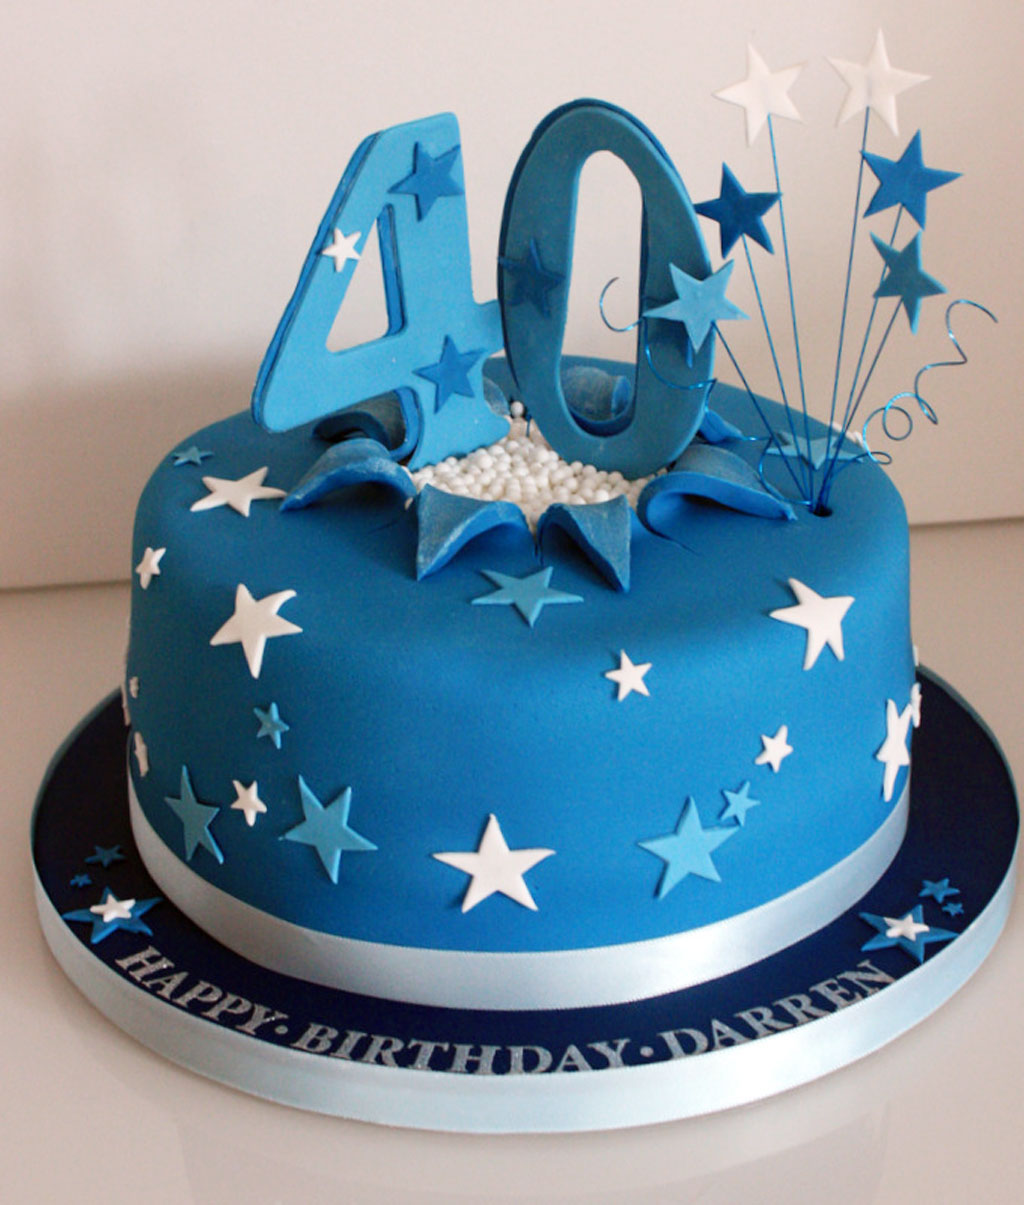 40th Birthday Cake Ideas Funny Birthday Cake